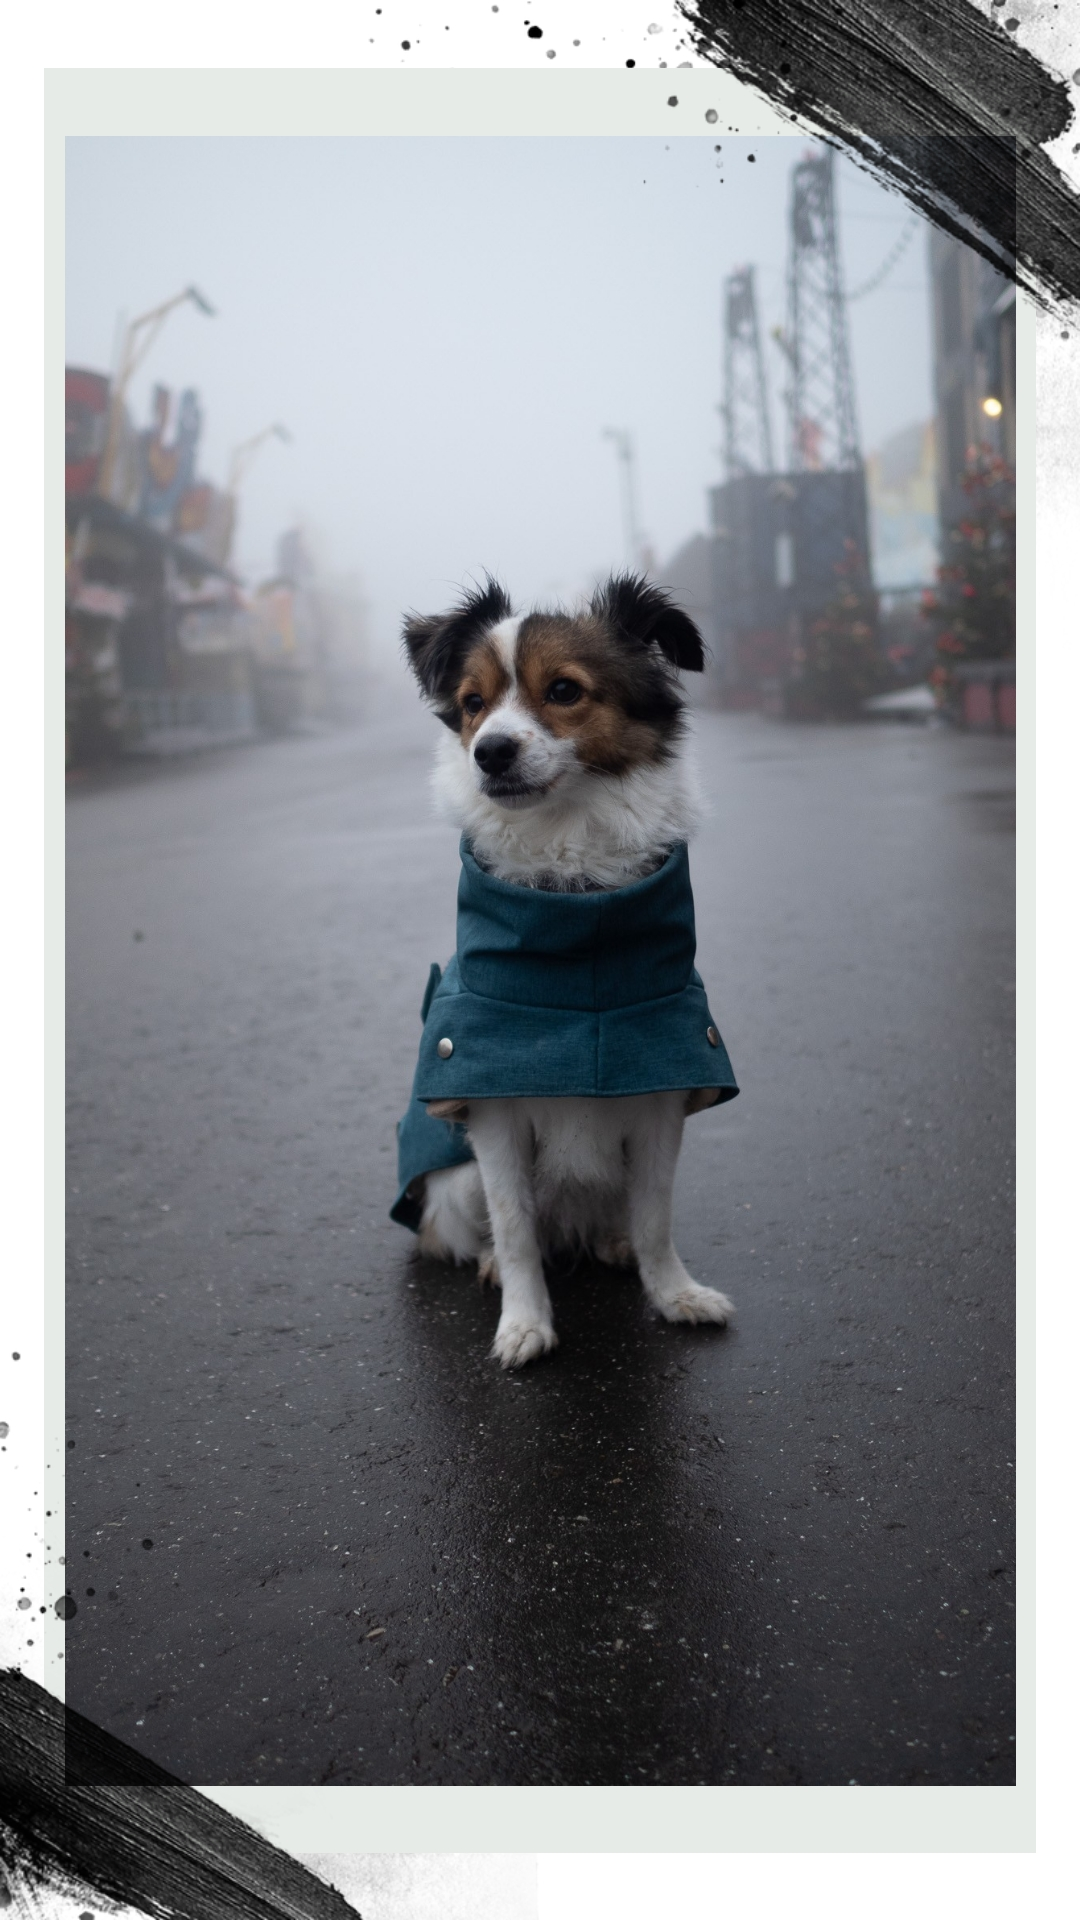 Yaska mit Hundemantel